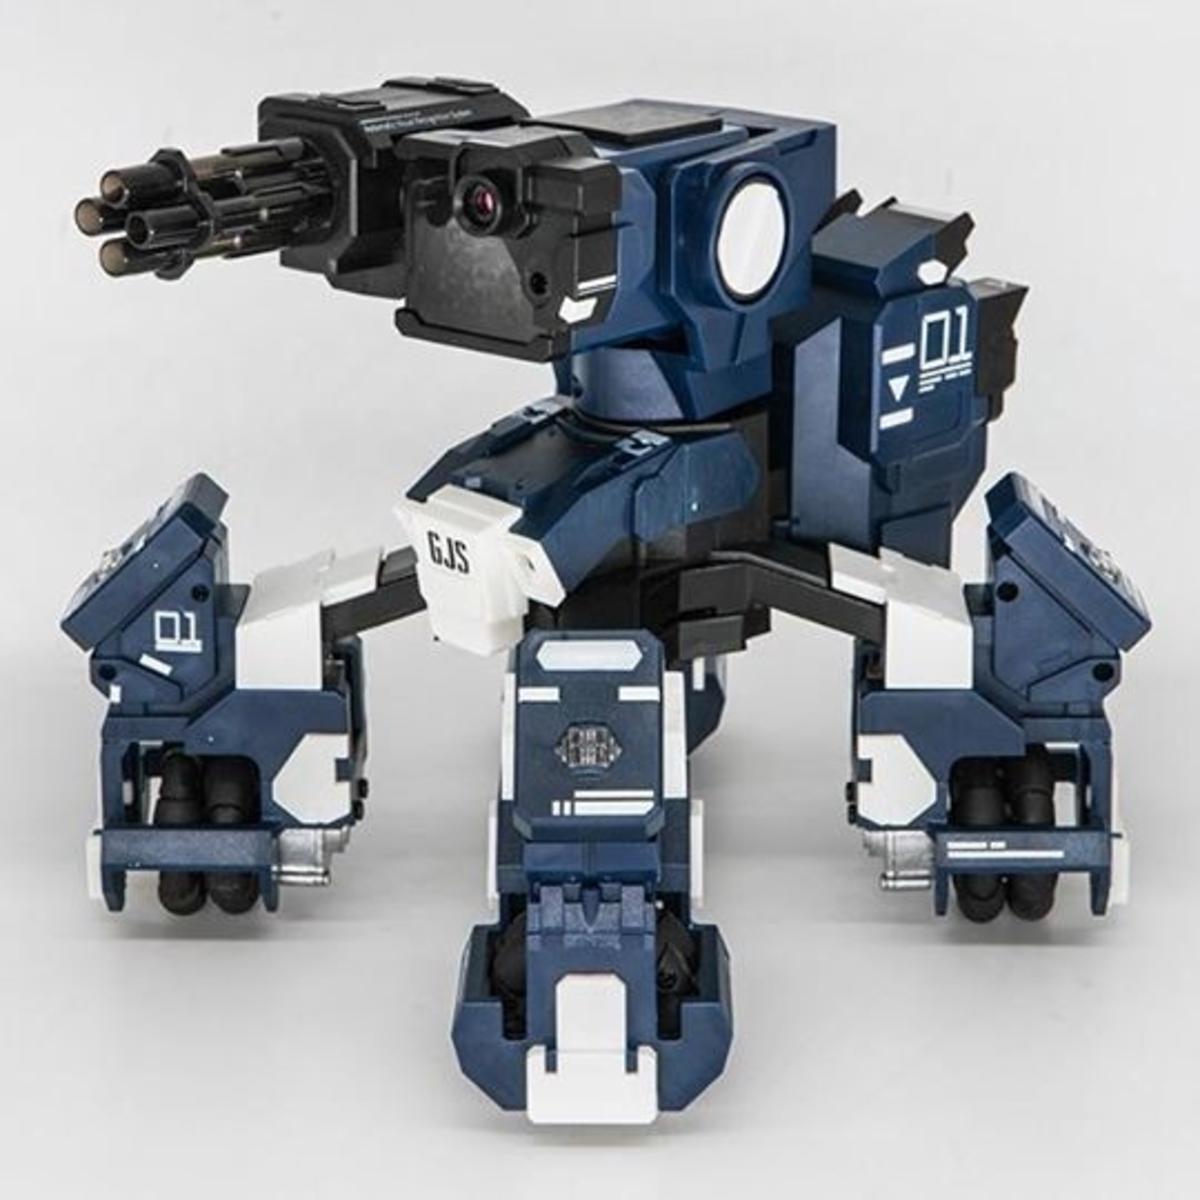 GJS 匠 即時對戰競技機器人 藍色 (行貨一年保養)